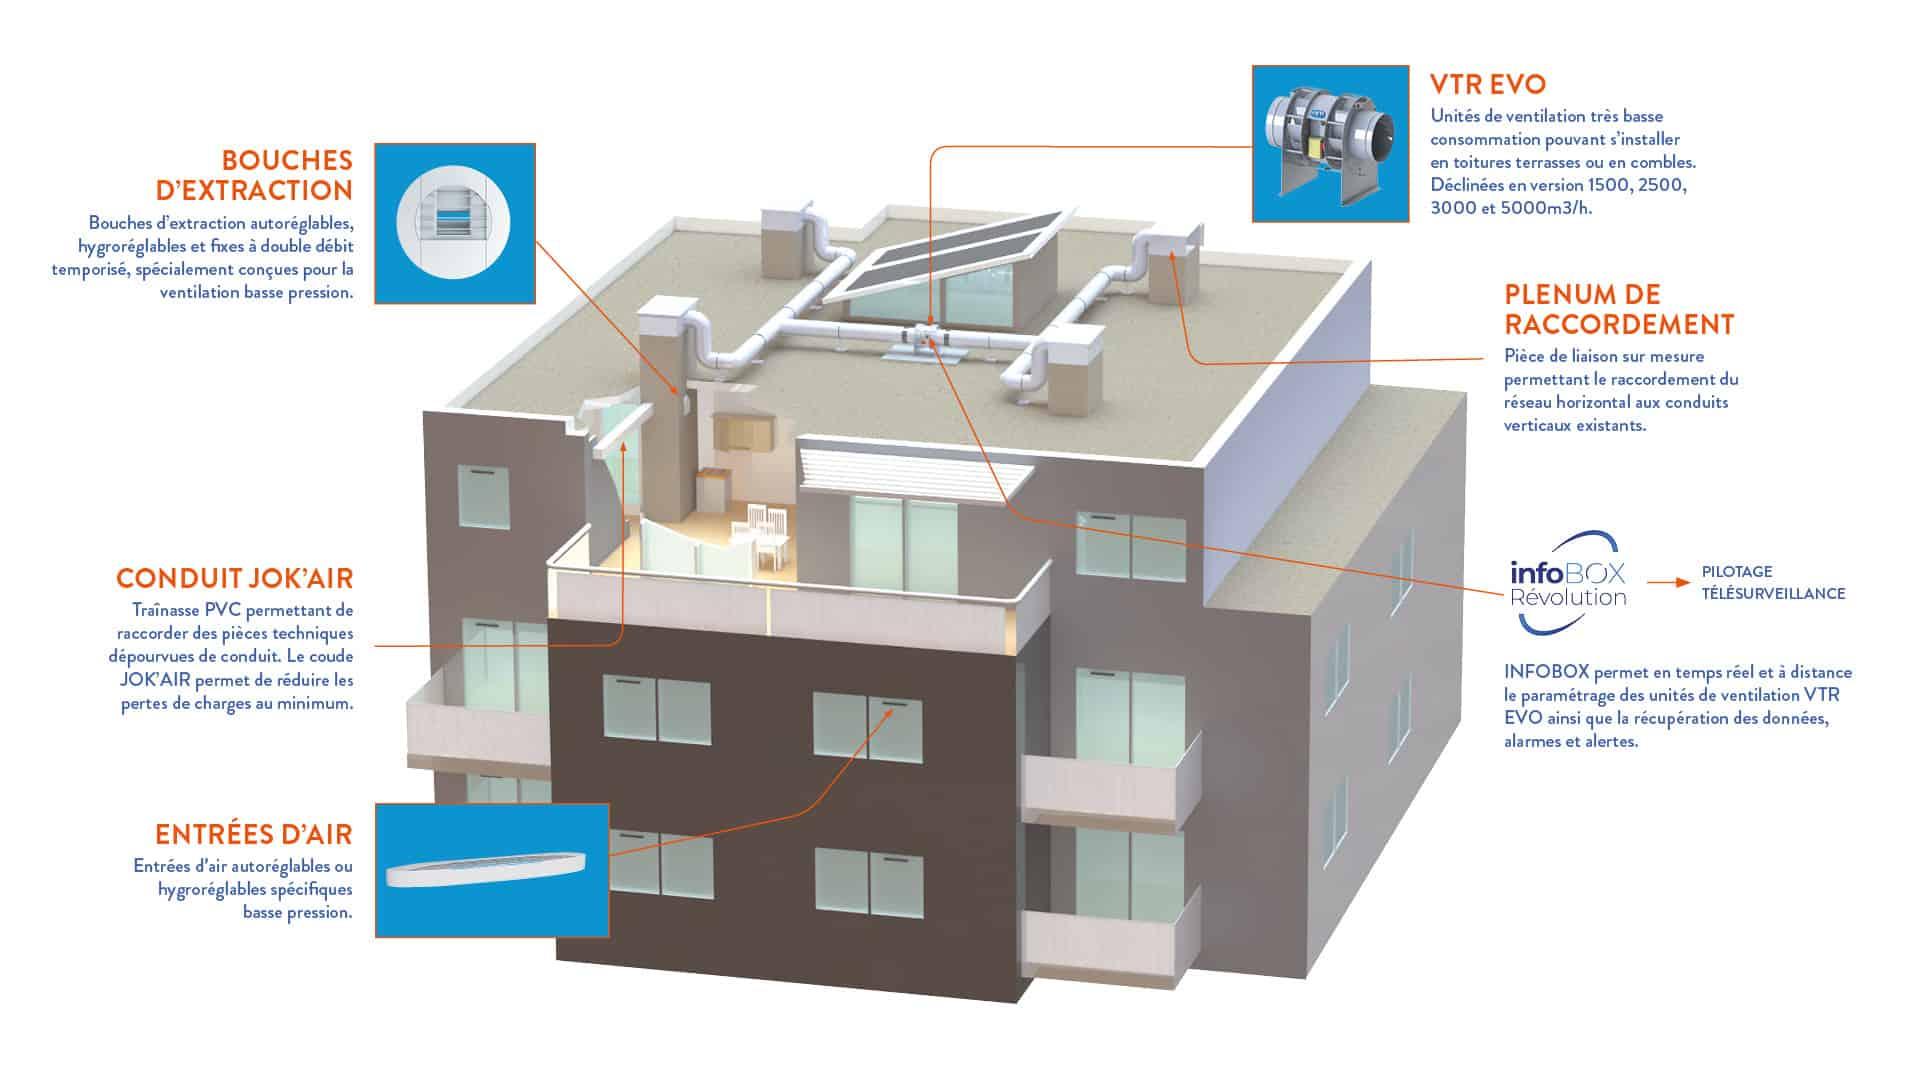 Solutions de ventilation mécanique basse pression VTI